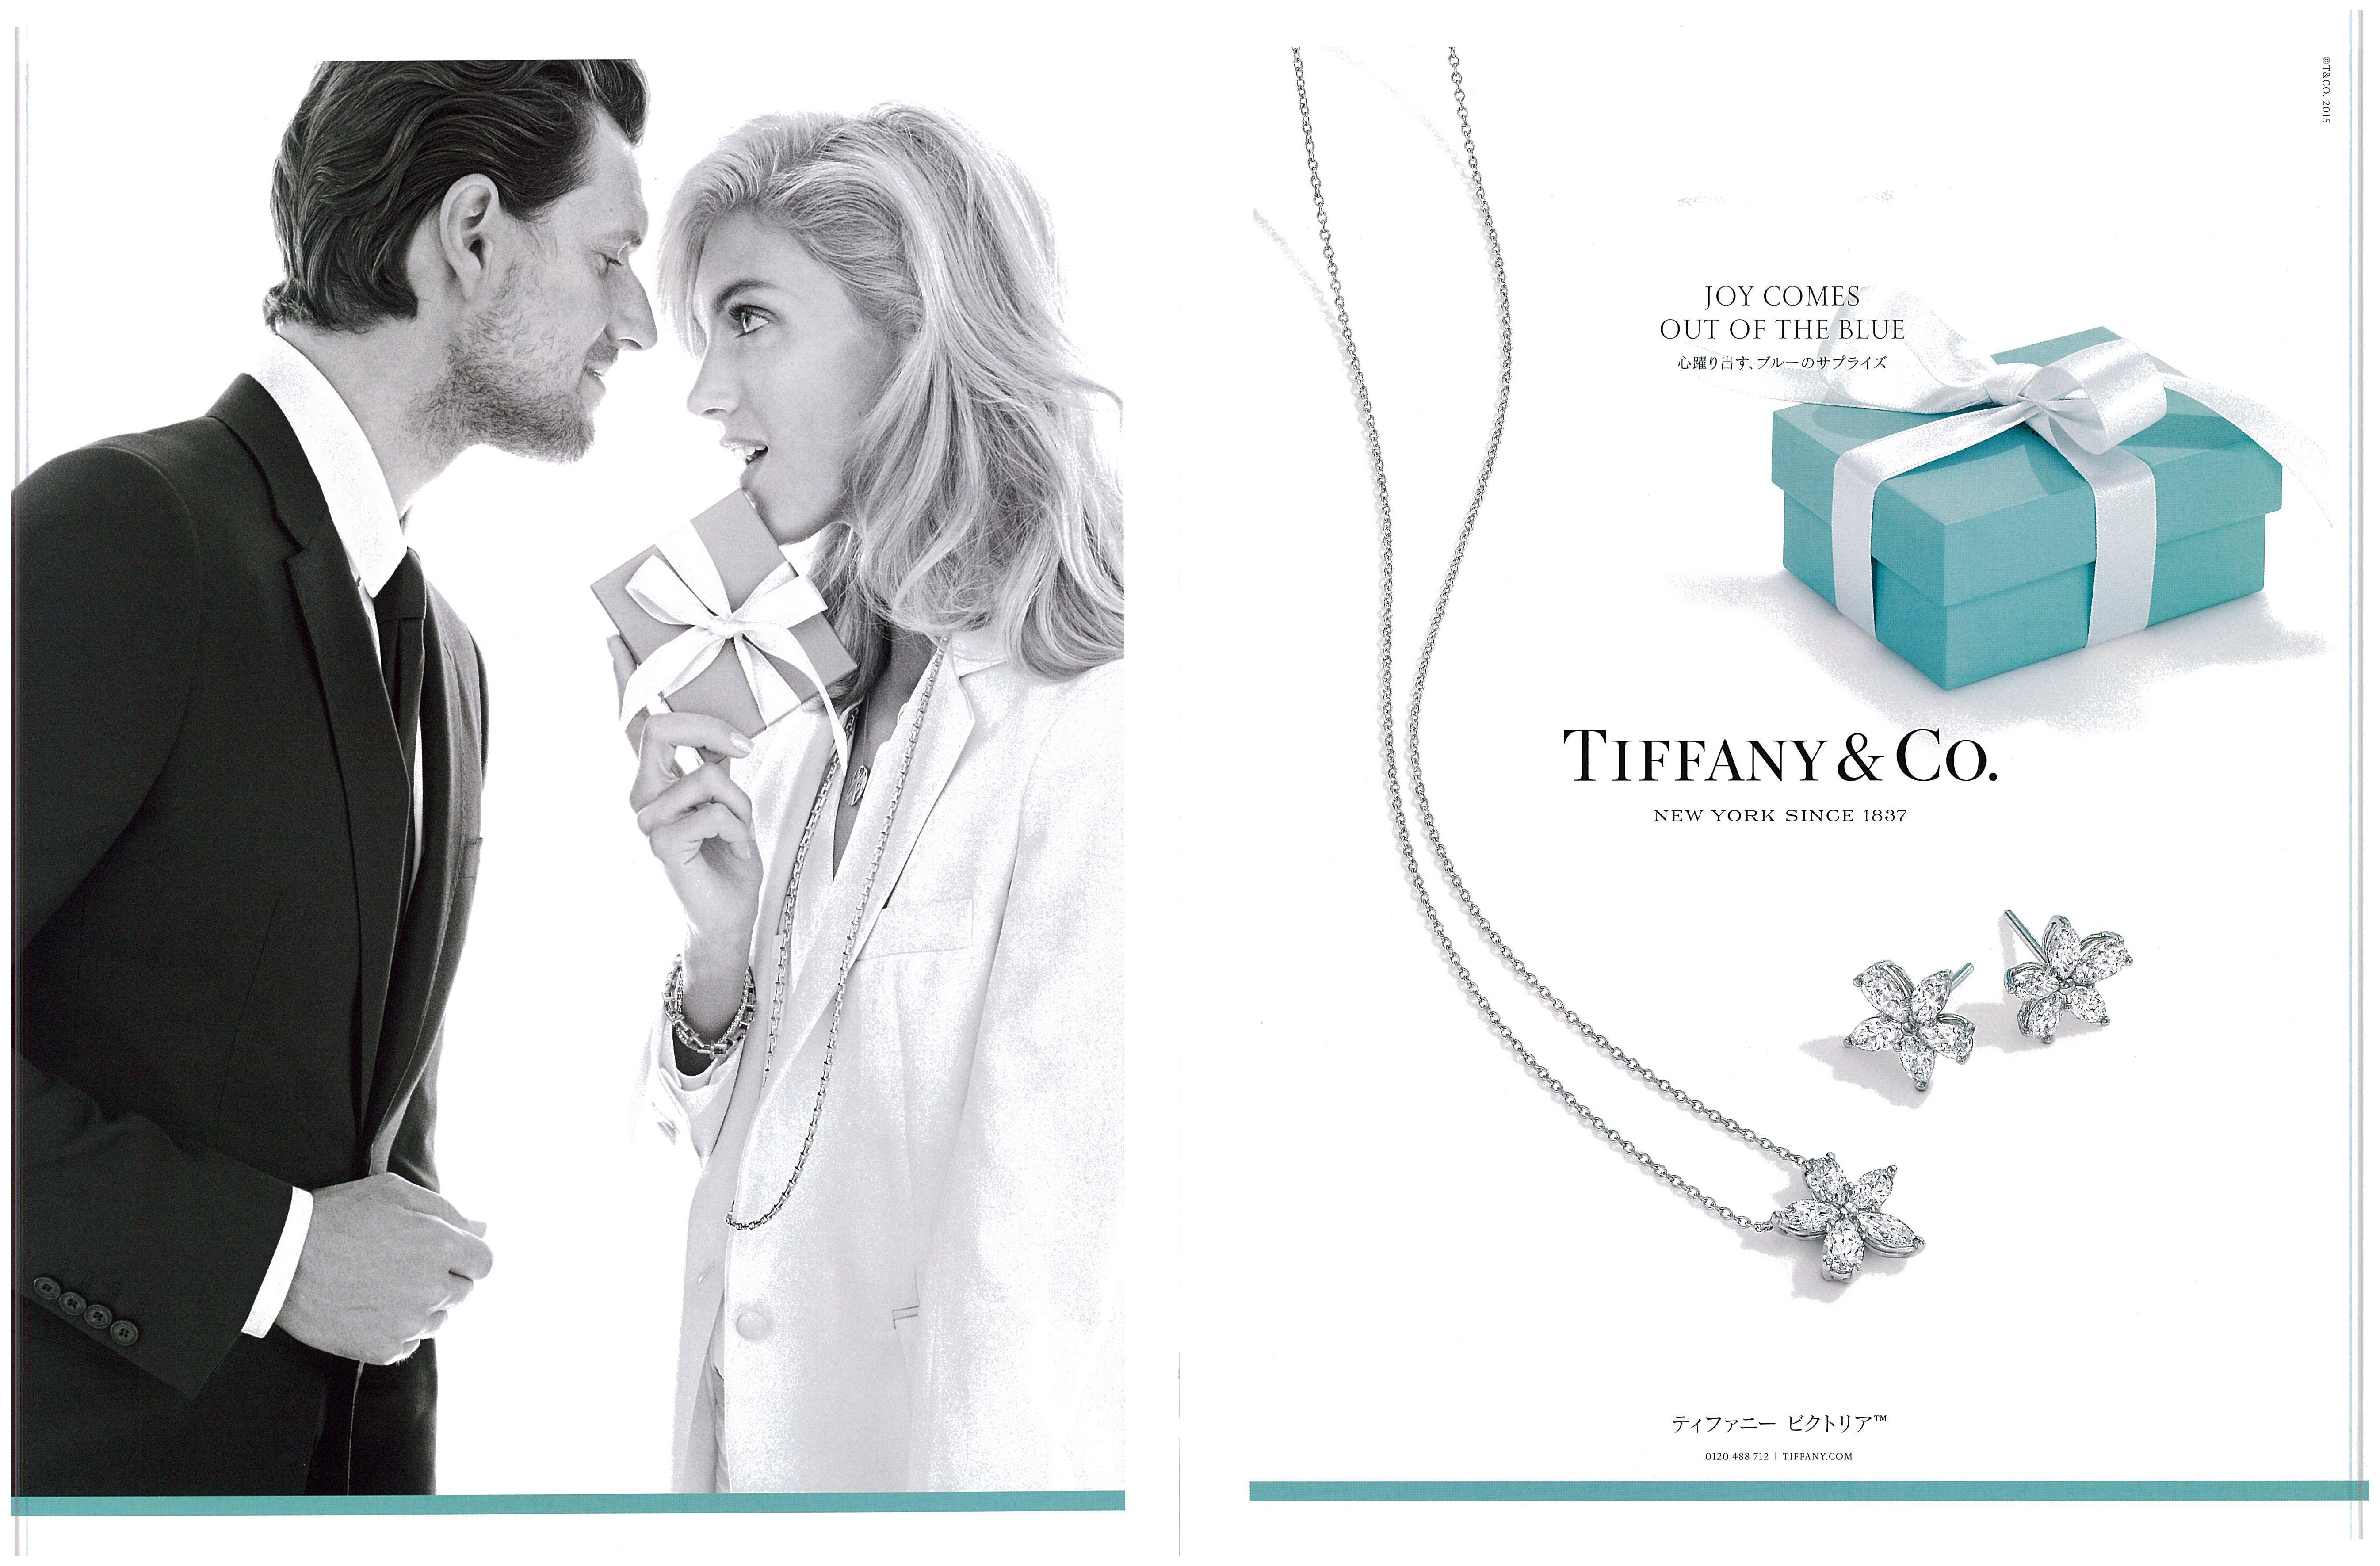 Tiffany & Co. Atlas Jewelry Campaign 2014 | Daria werbowy, Tiffany and  Campaign